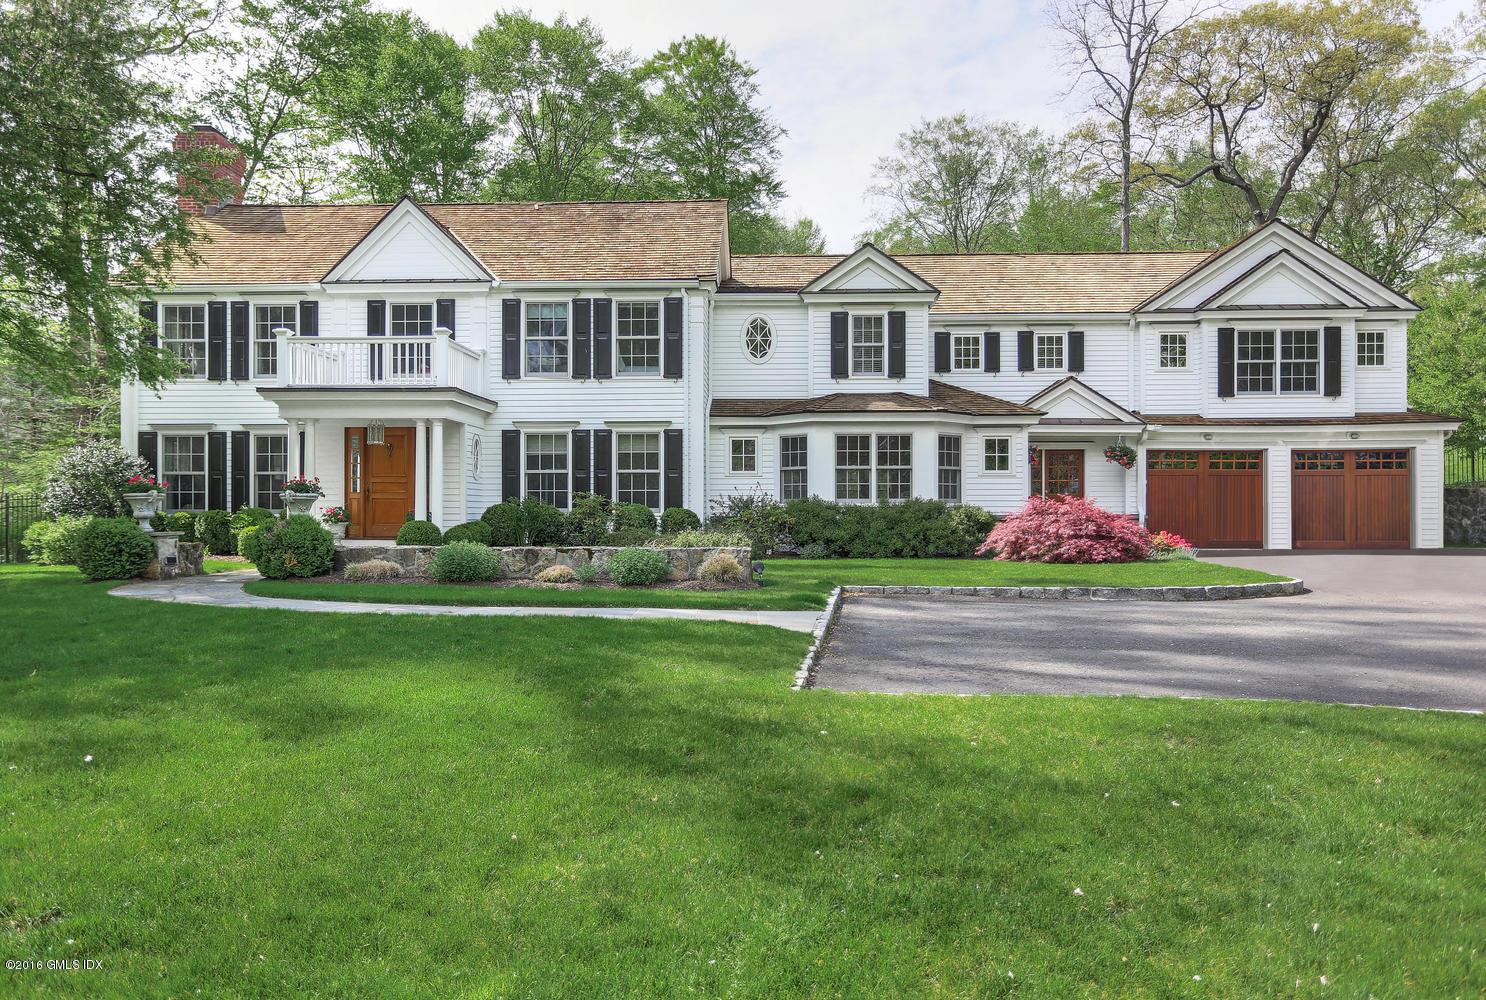 92 Rockwood Lane,Greenwich,Connecticut 06830,5 Bedrooms Bedrooms,5 BathroomsBathrooms,Single family,Rockwood,106656